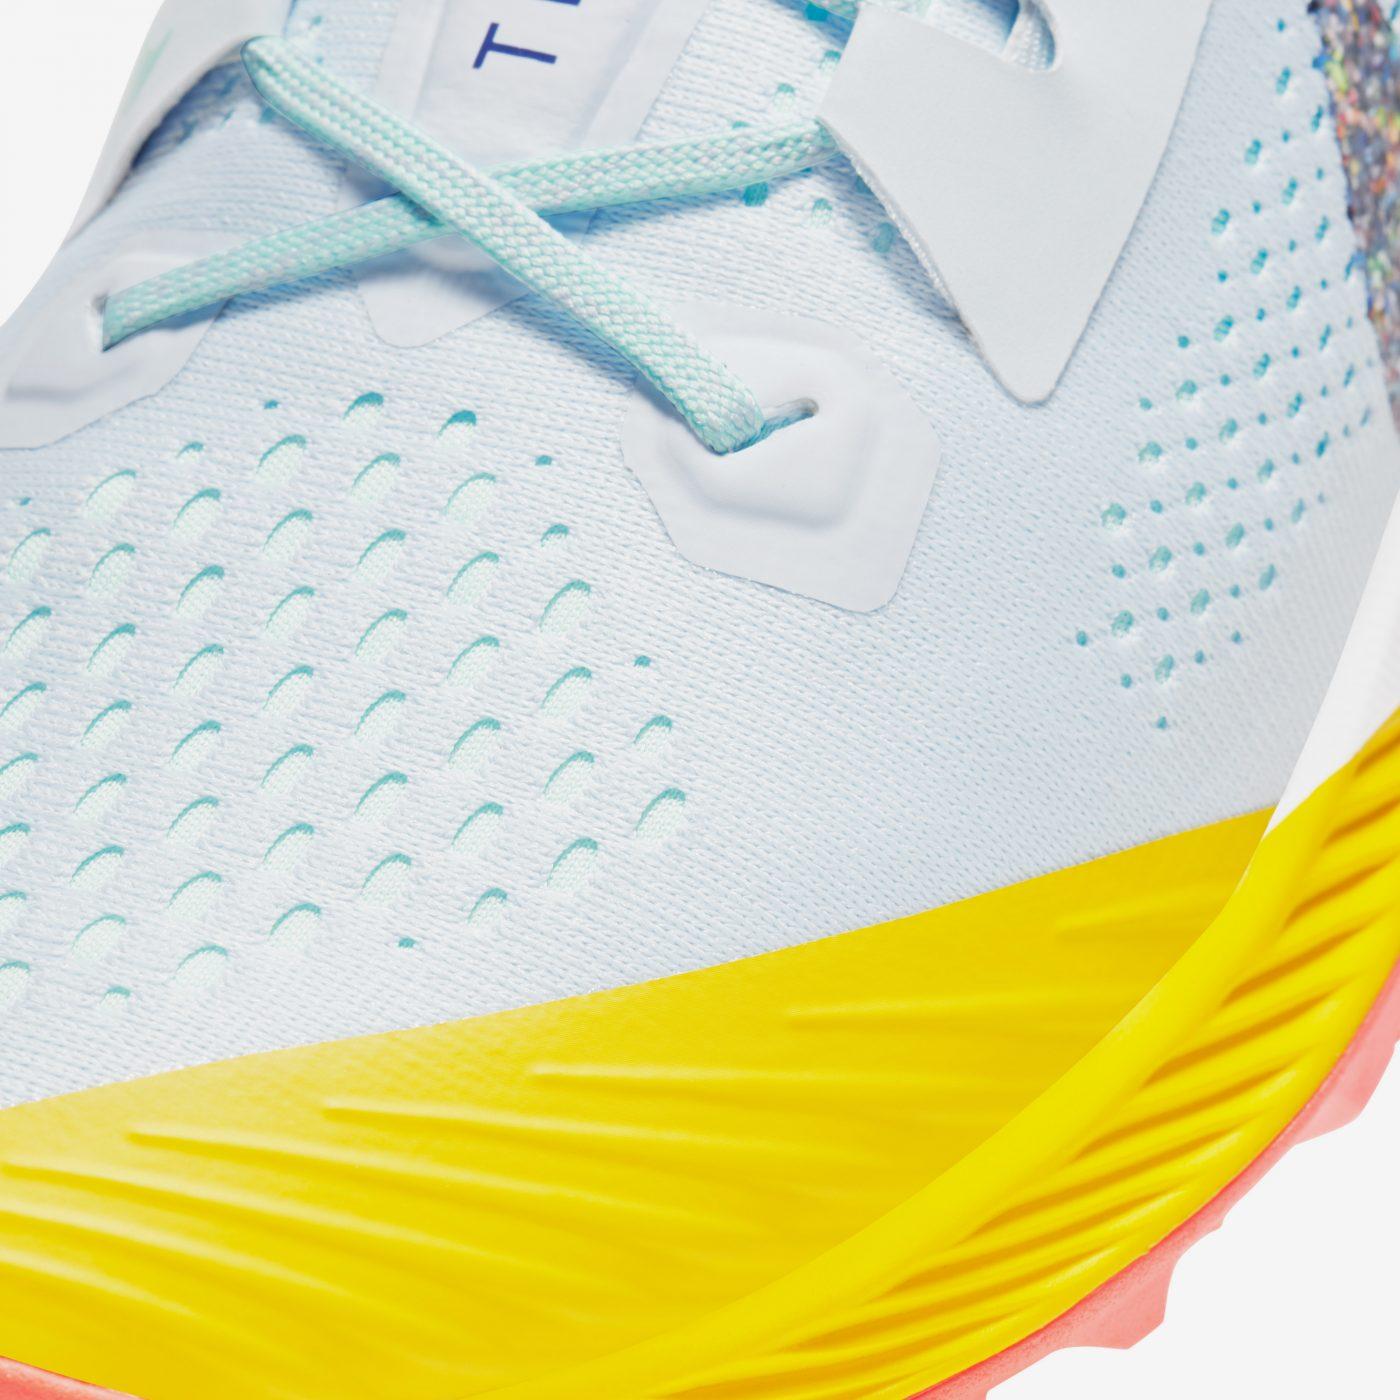 nike-chaussures-trail-Air-Zoom-Terra-Kiger-6-6-runpack-1